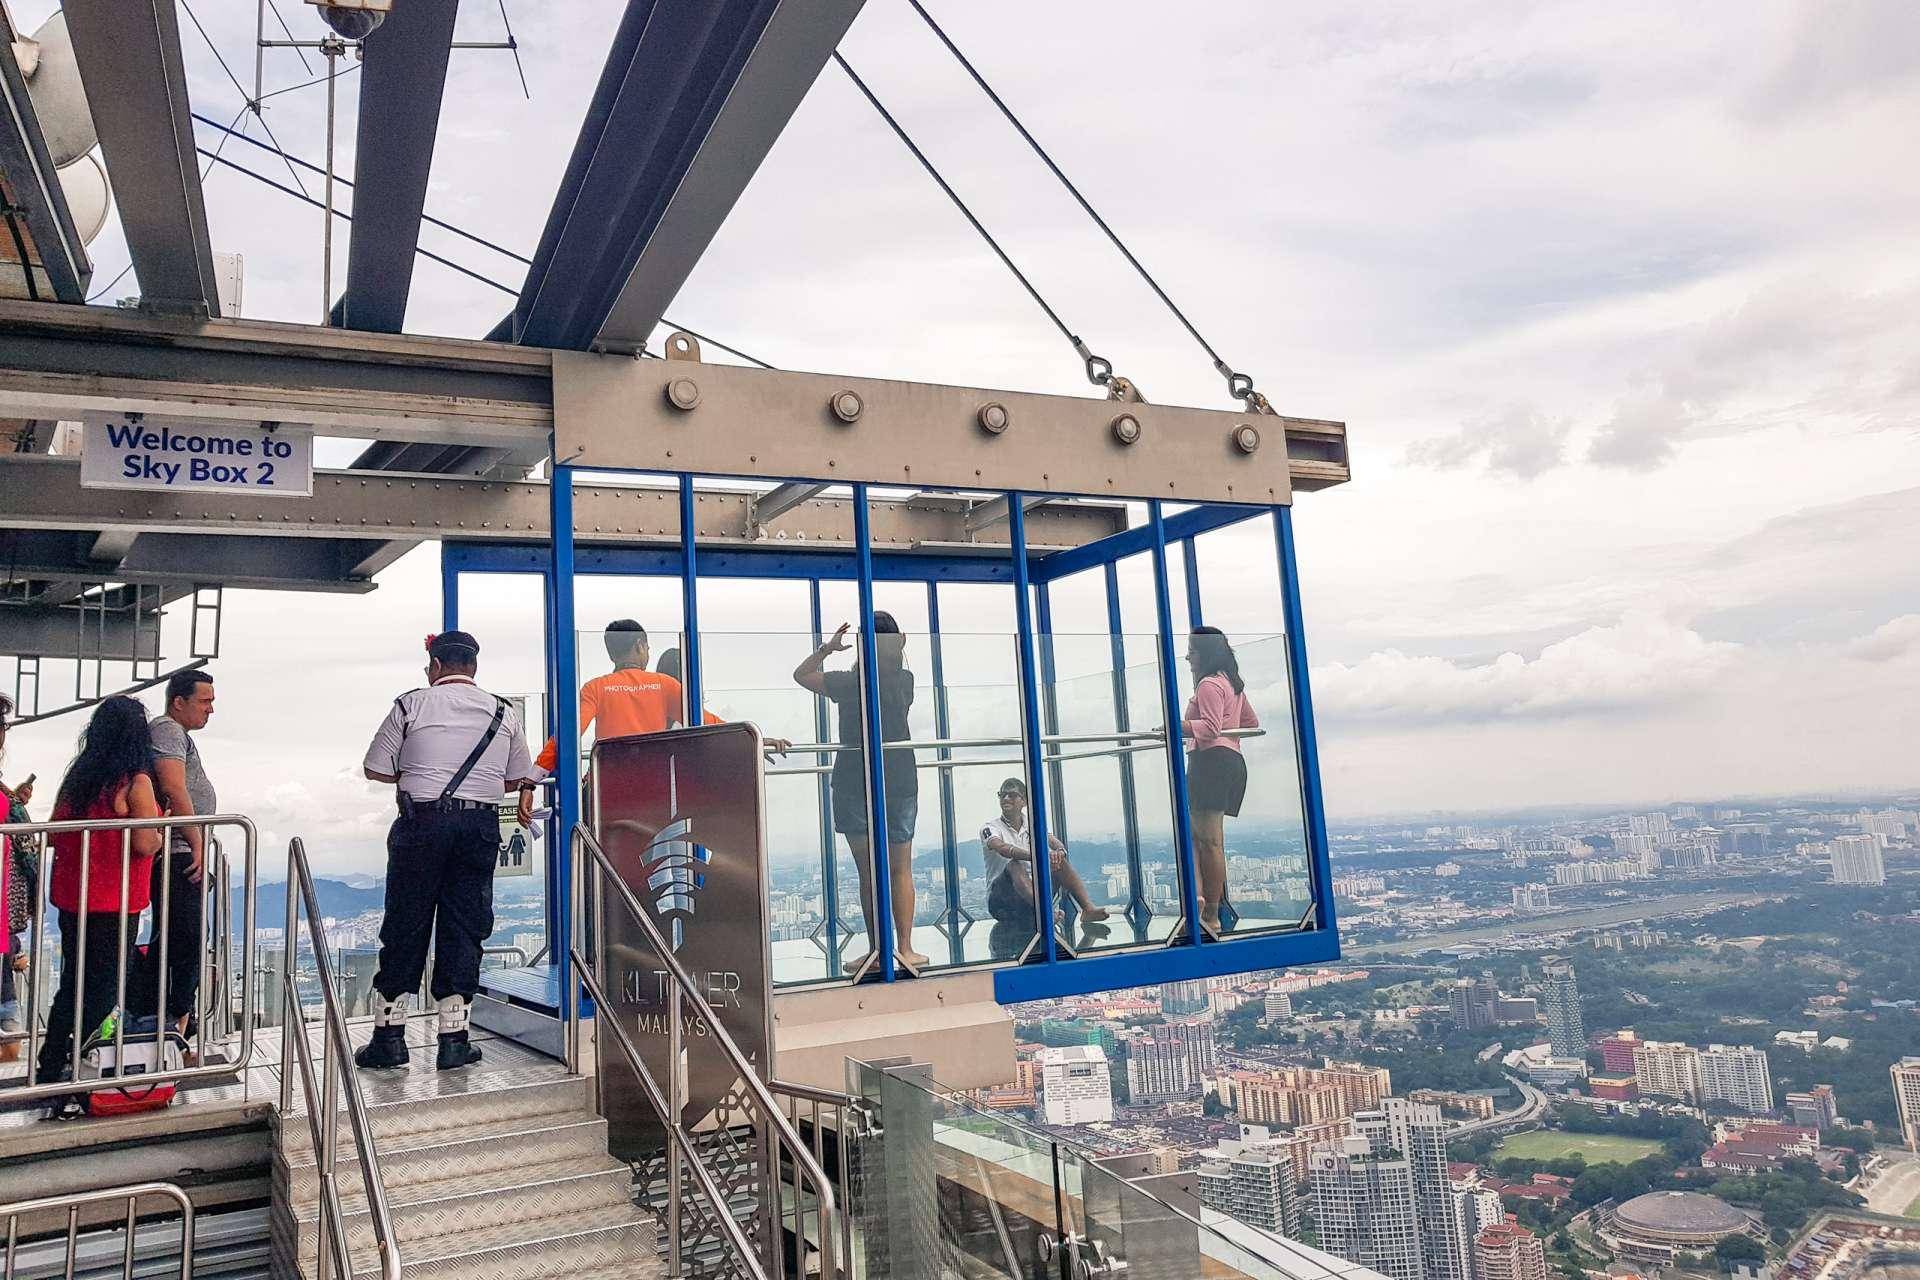 Malaysia Kuala Lumpur sky box